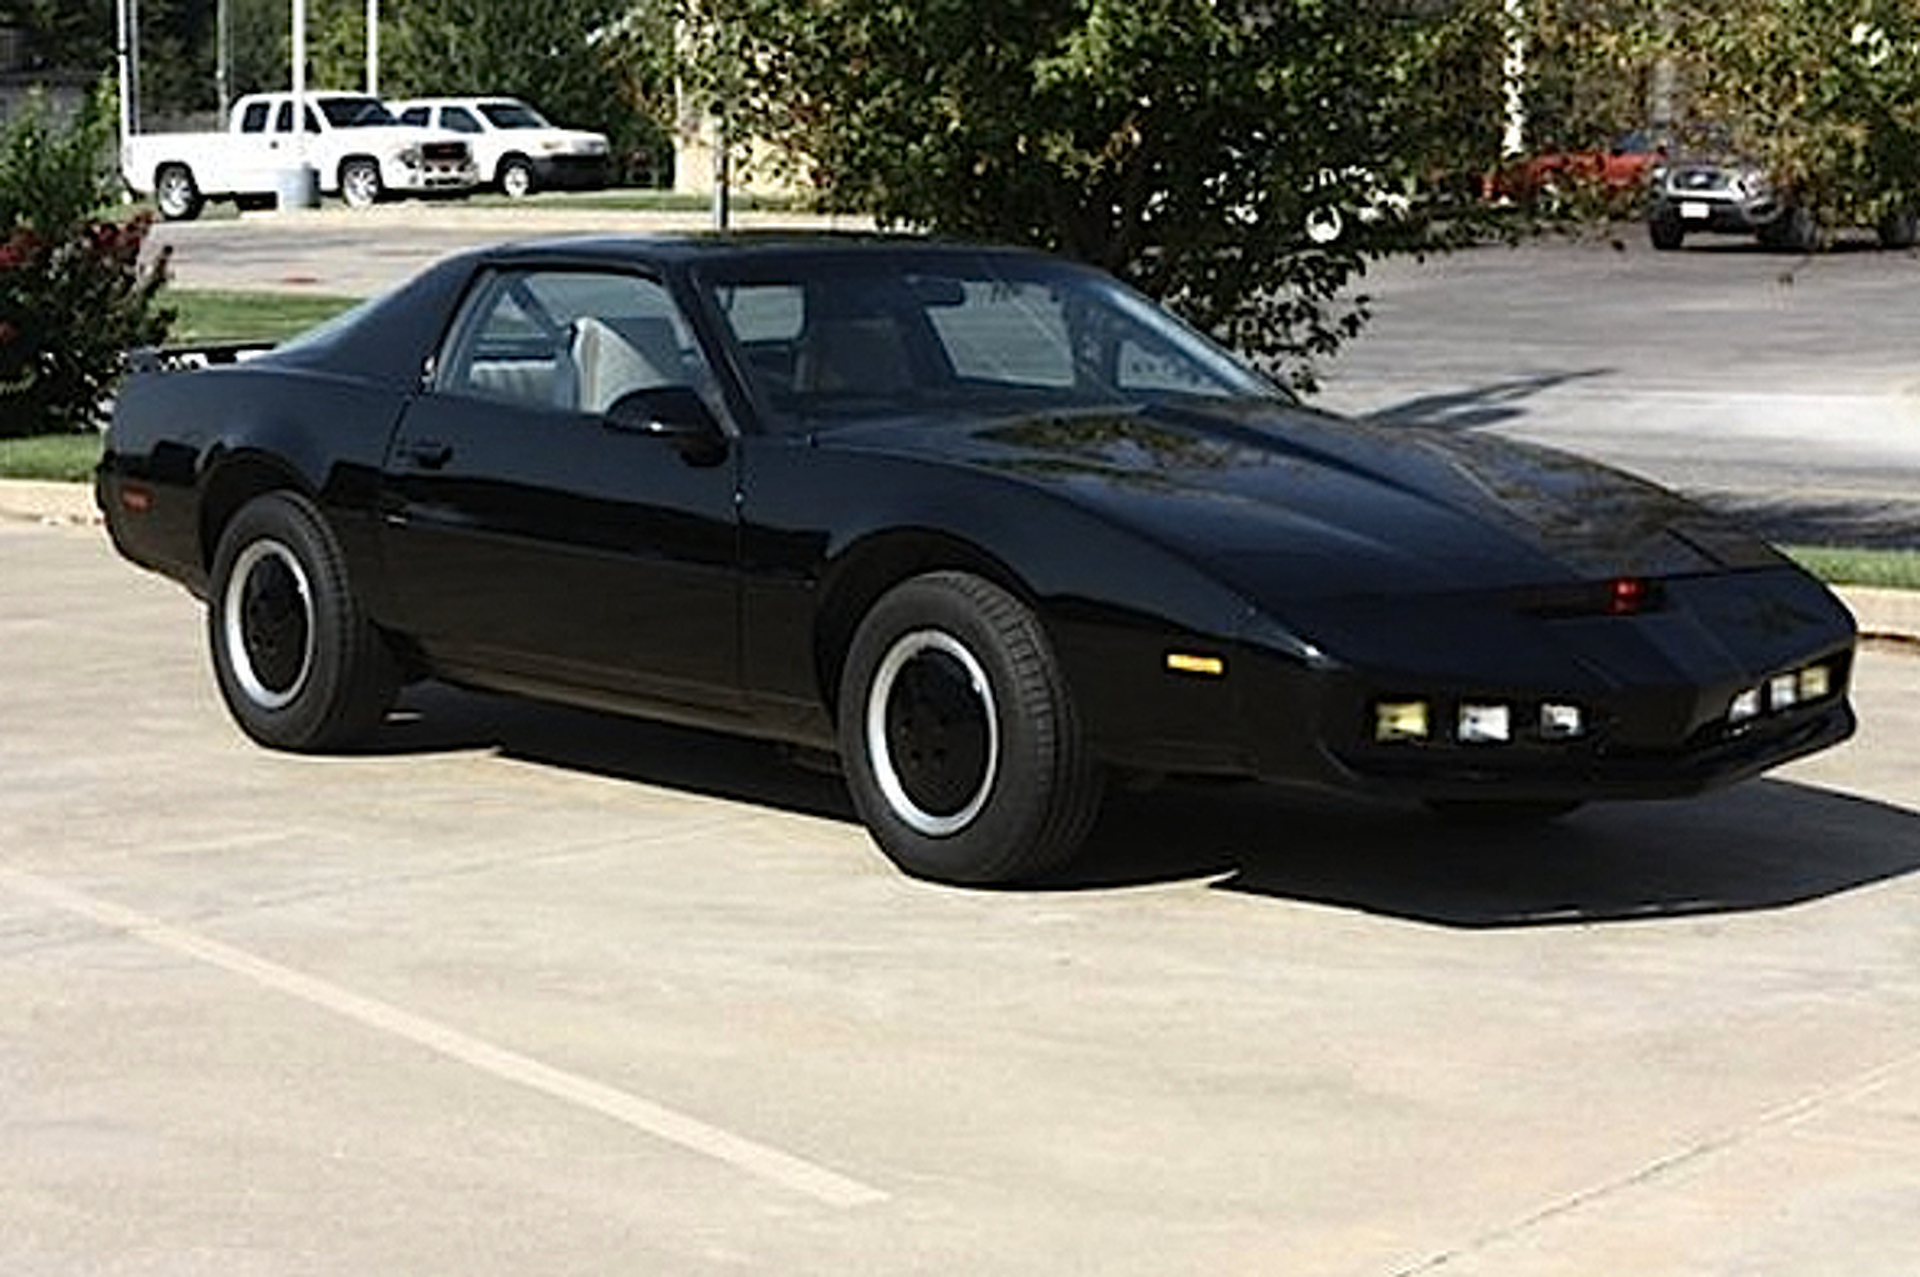 EBay Car Of The Week: 1986 Pontiac Firebird Knight Rider